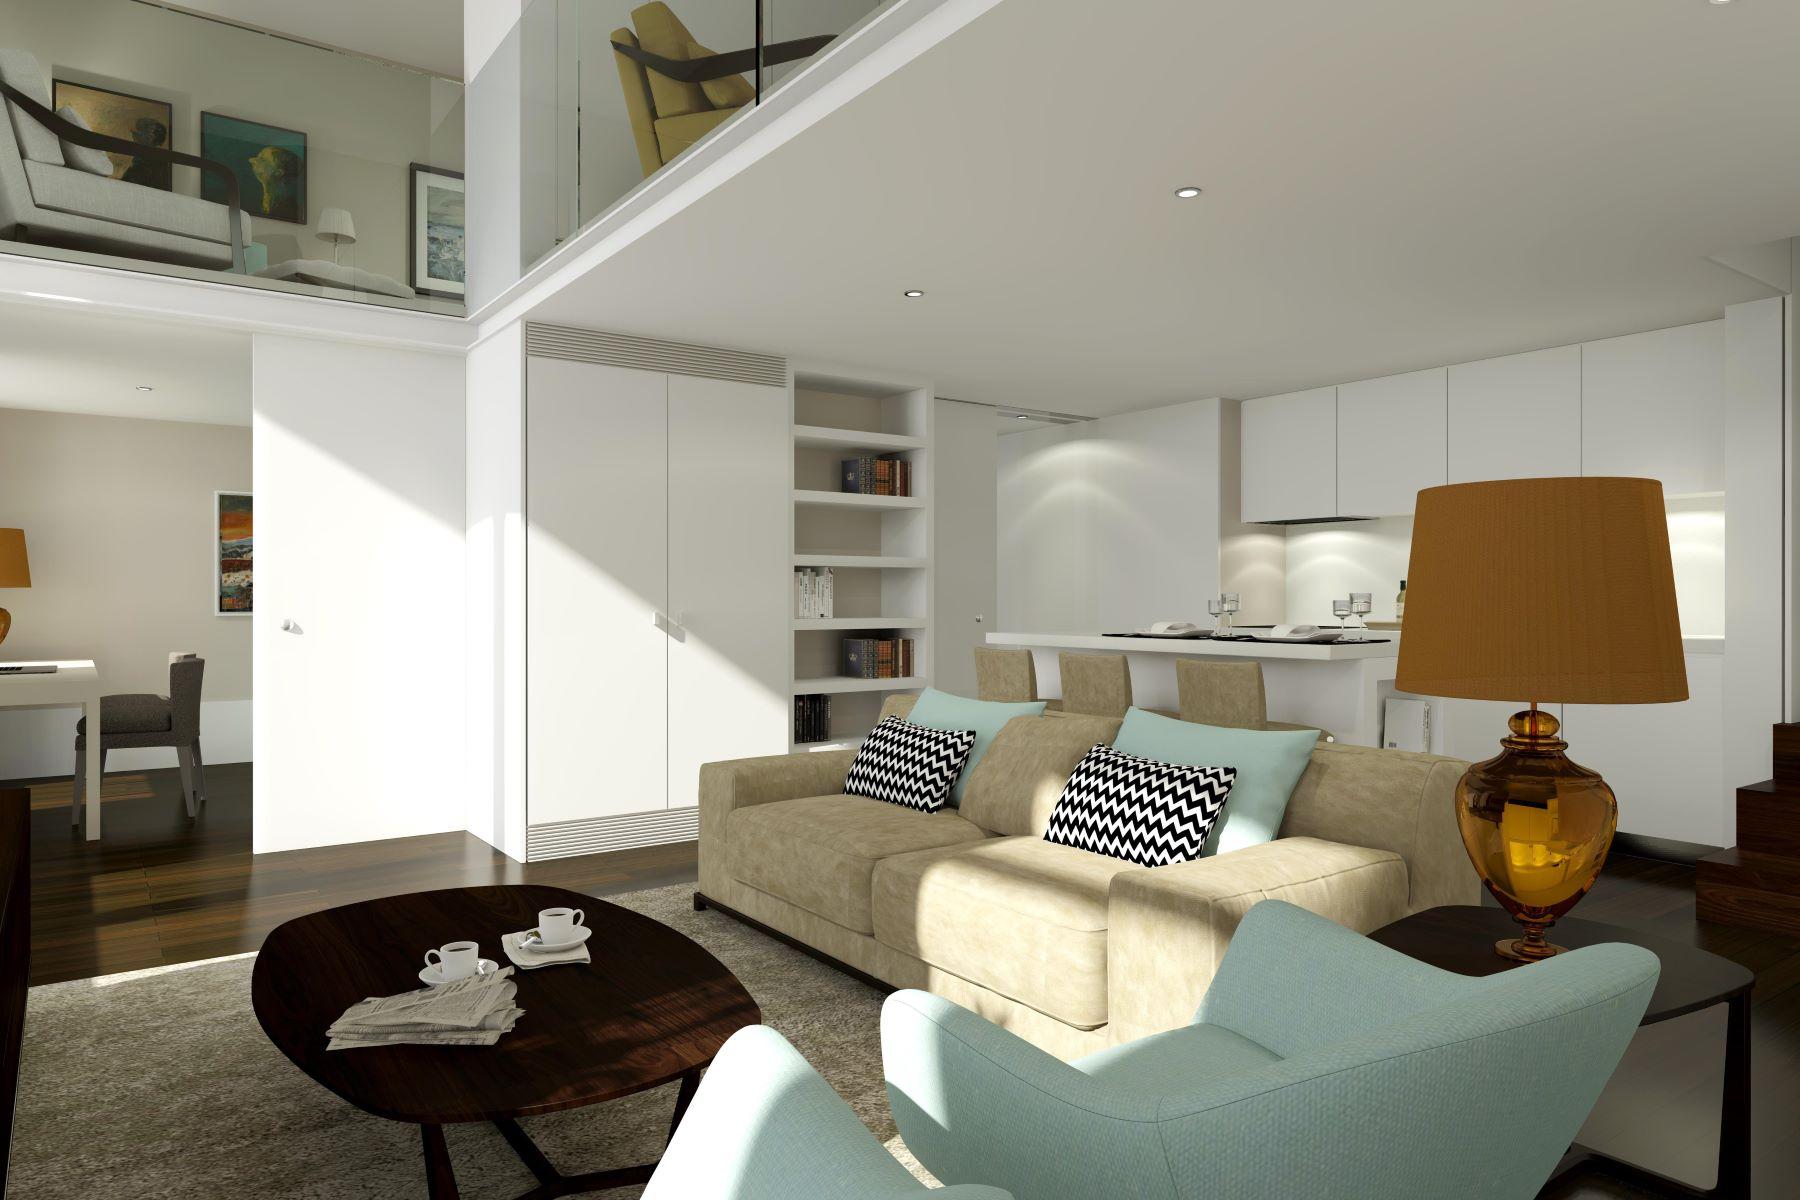 Apartment for Sale at Loft, 1 bedrooms, for Sale Lisboa, Lisboa, Portugal